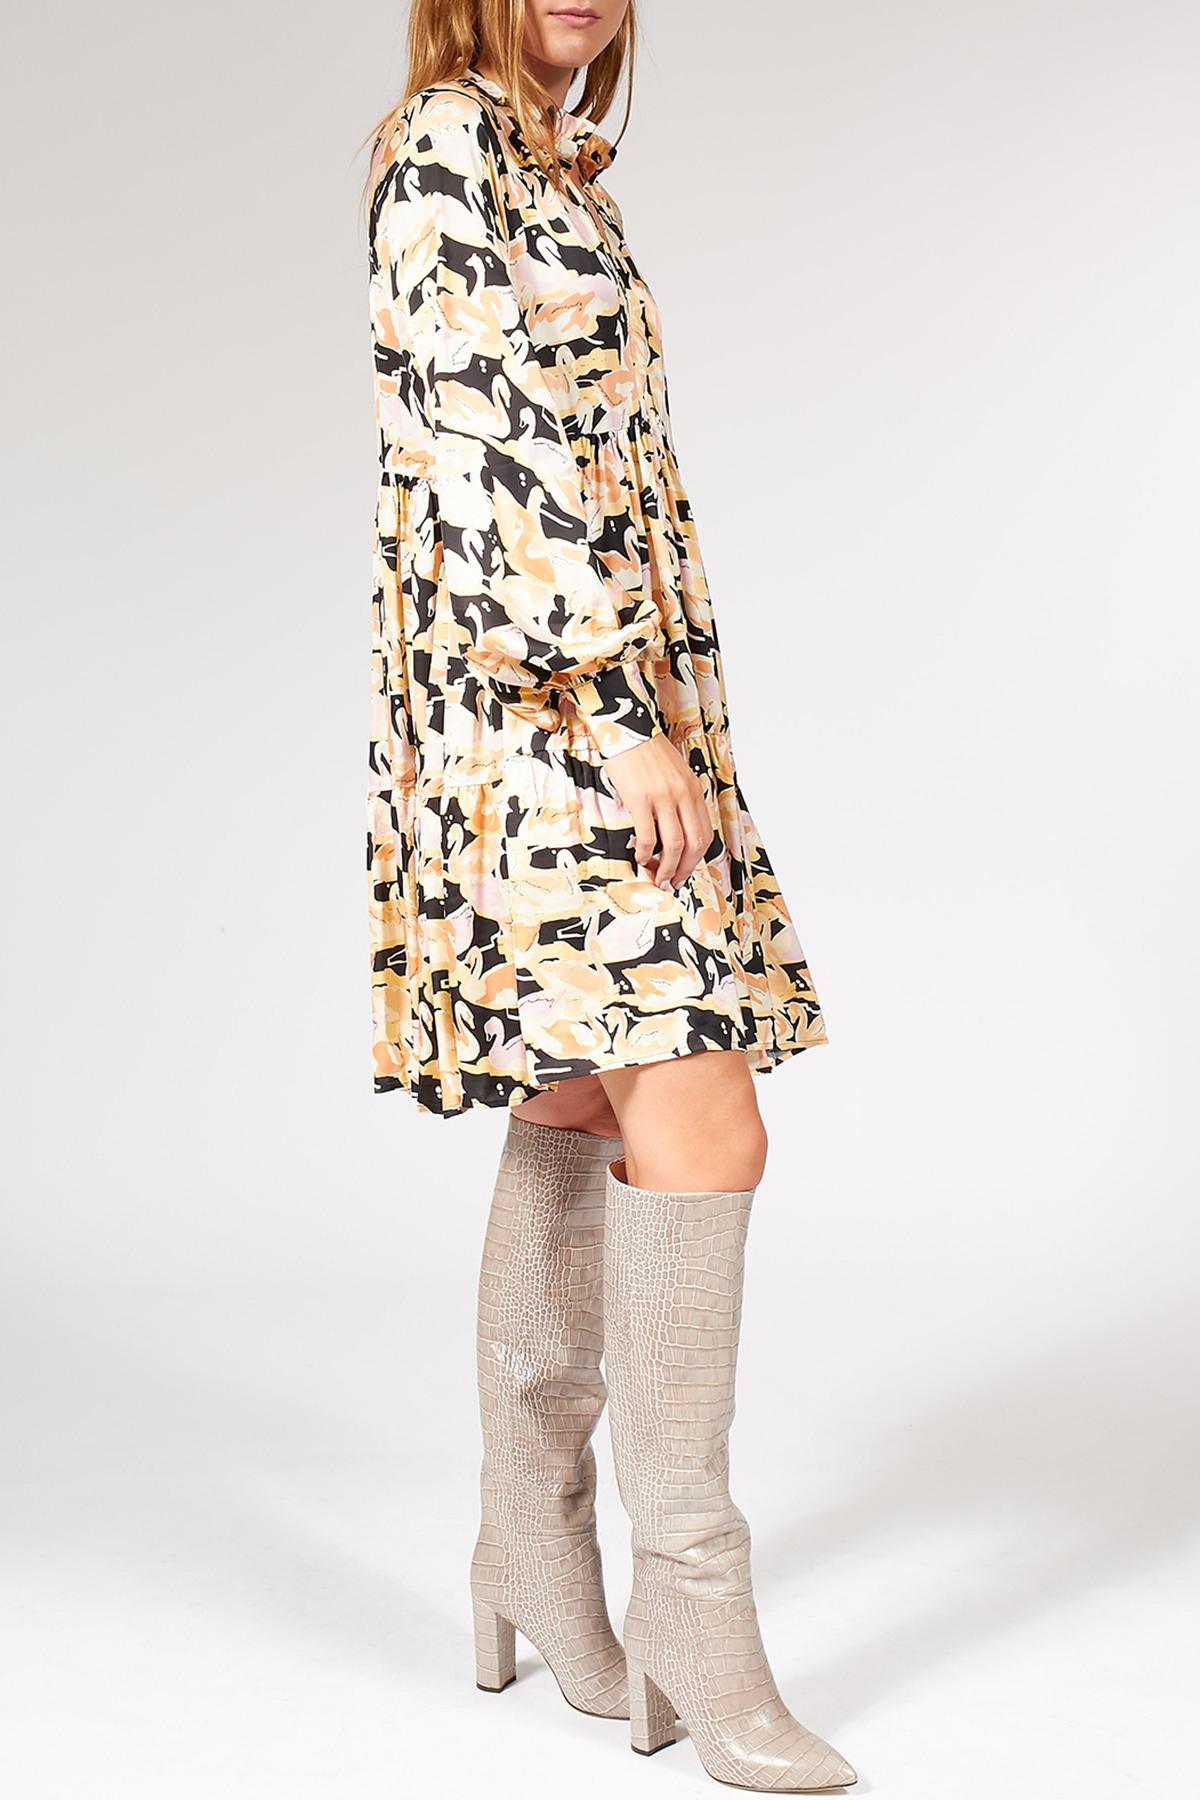 Kleid Jasmine Aus Viskose  Stine Goya  Myclassico